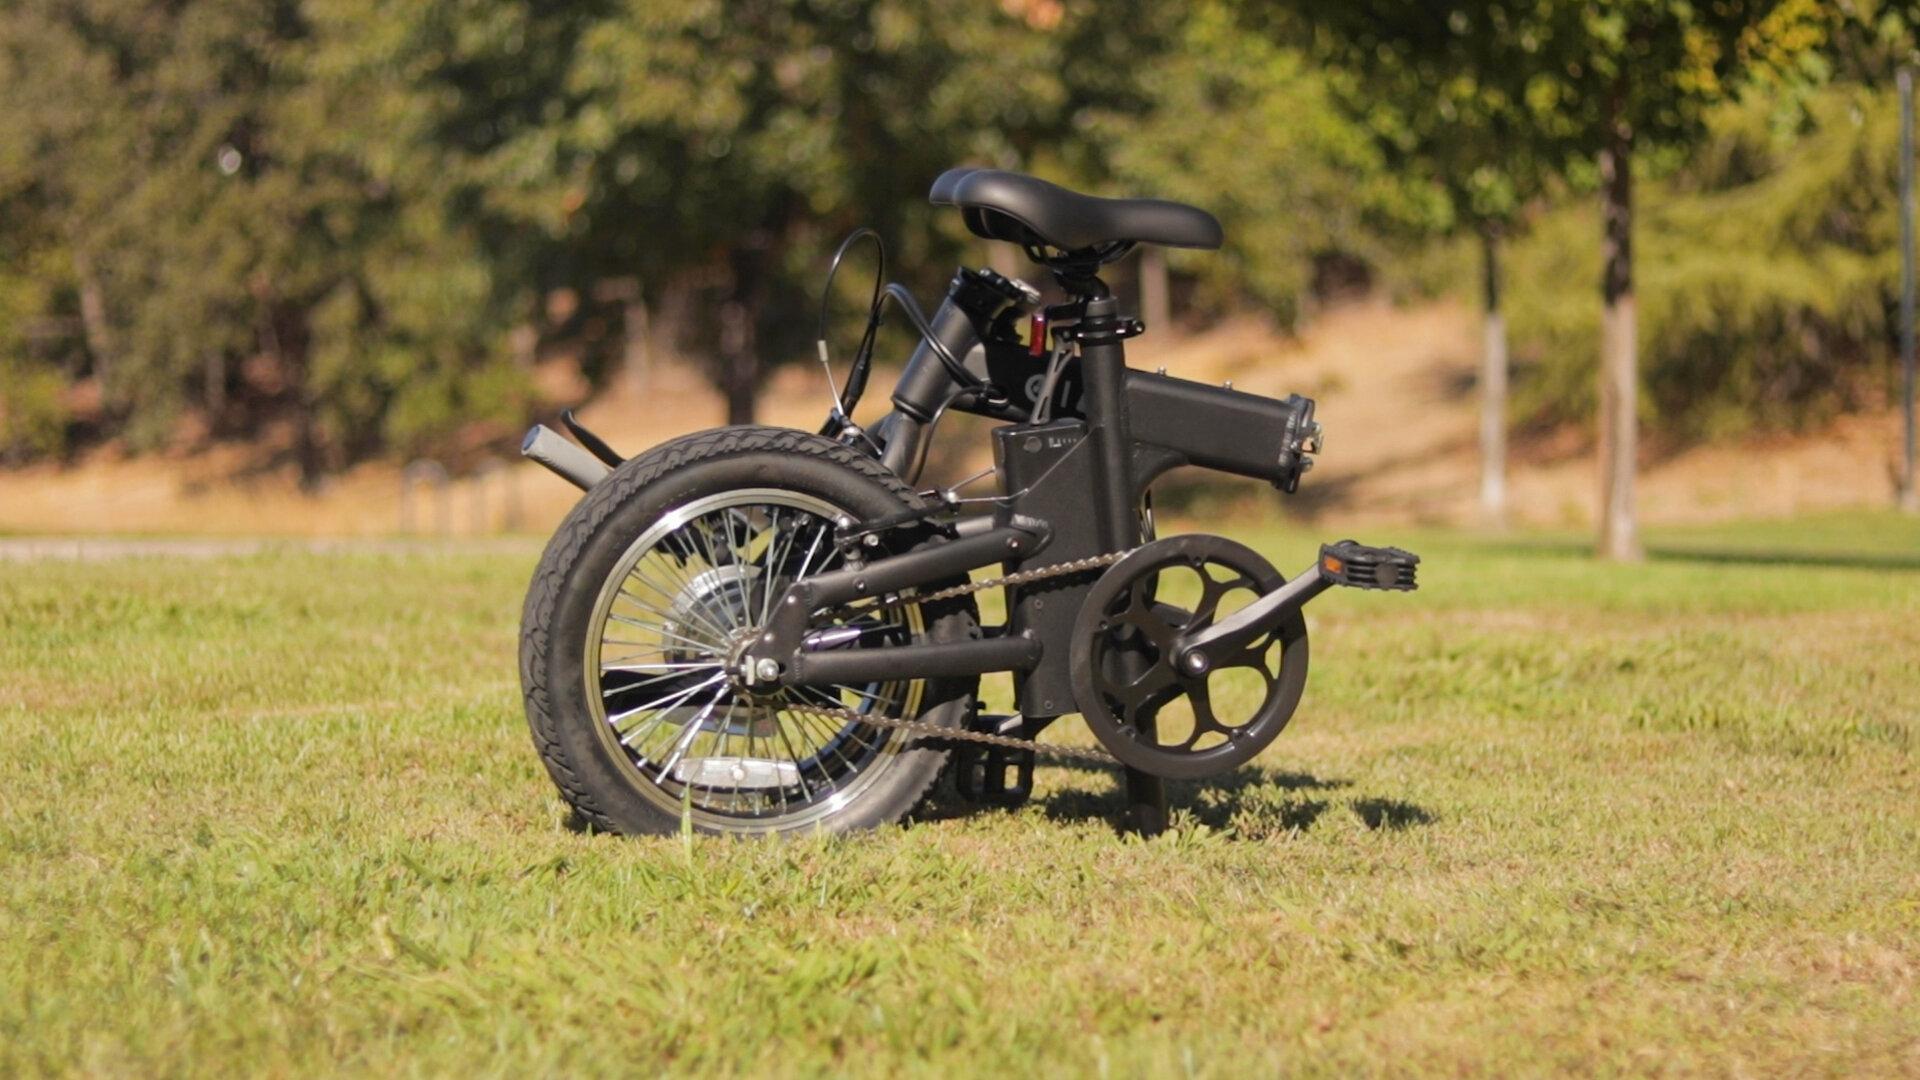 gotrax-shift-s1-electric-bike-review-2019-folded-2.jpg